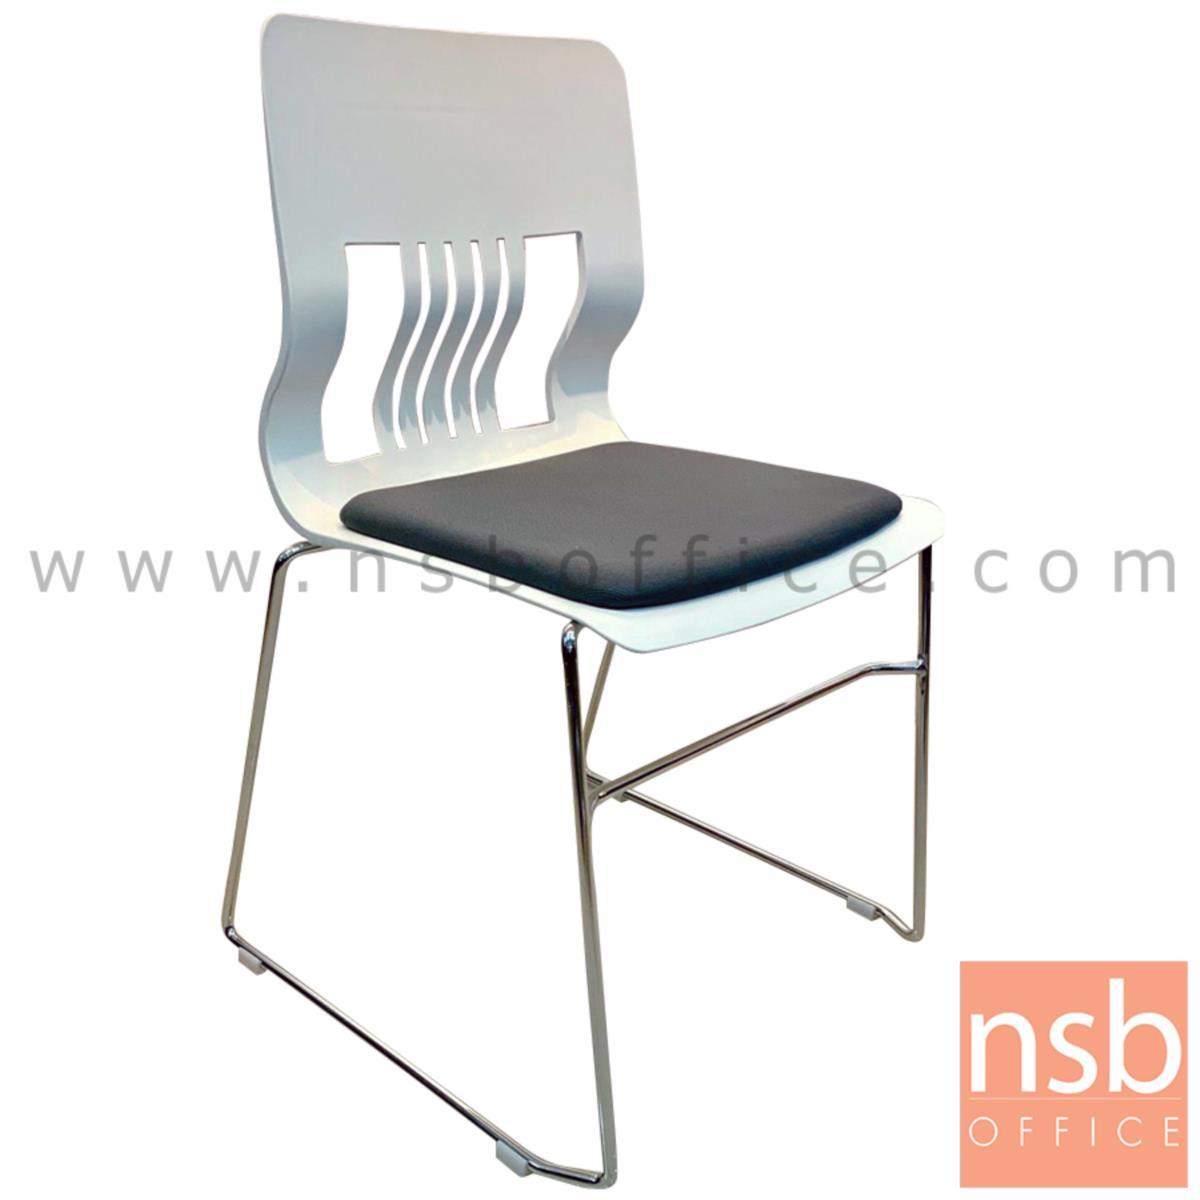 B05A171:เก้าอี้อเนกประสงค์เฟรมโพลี่ รุ่น Wyndham (วินดัม)  ขาเหล็กเพลาตัน ชุบโครเมี่ยม